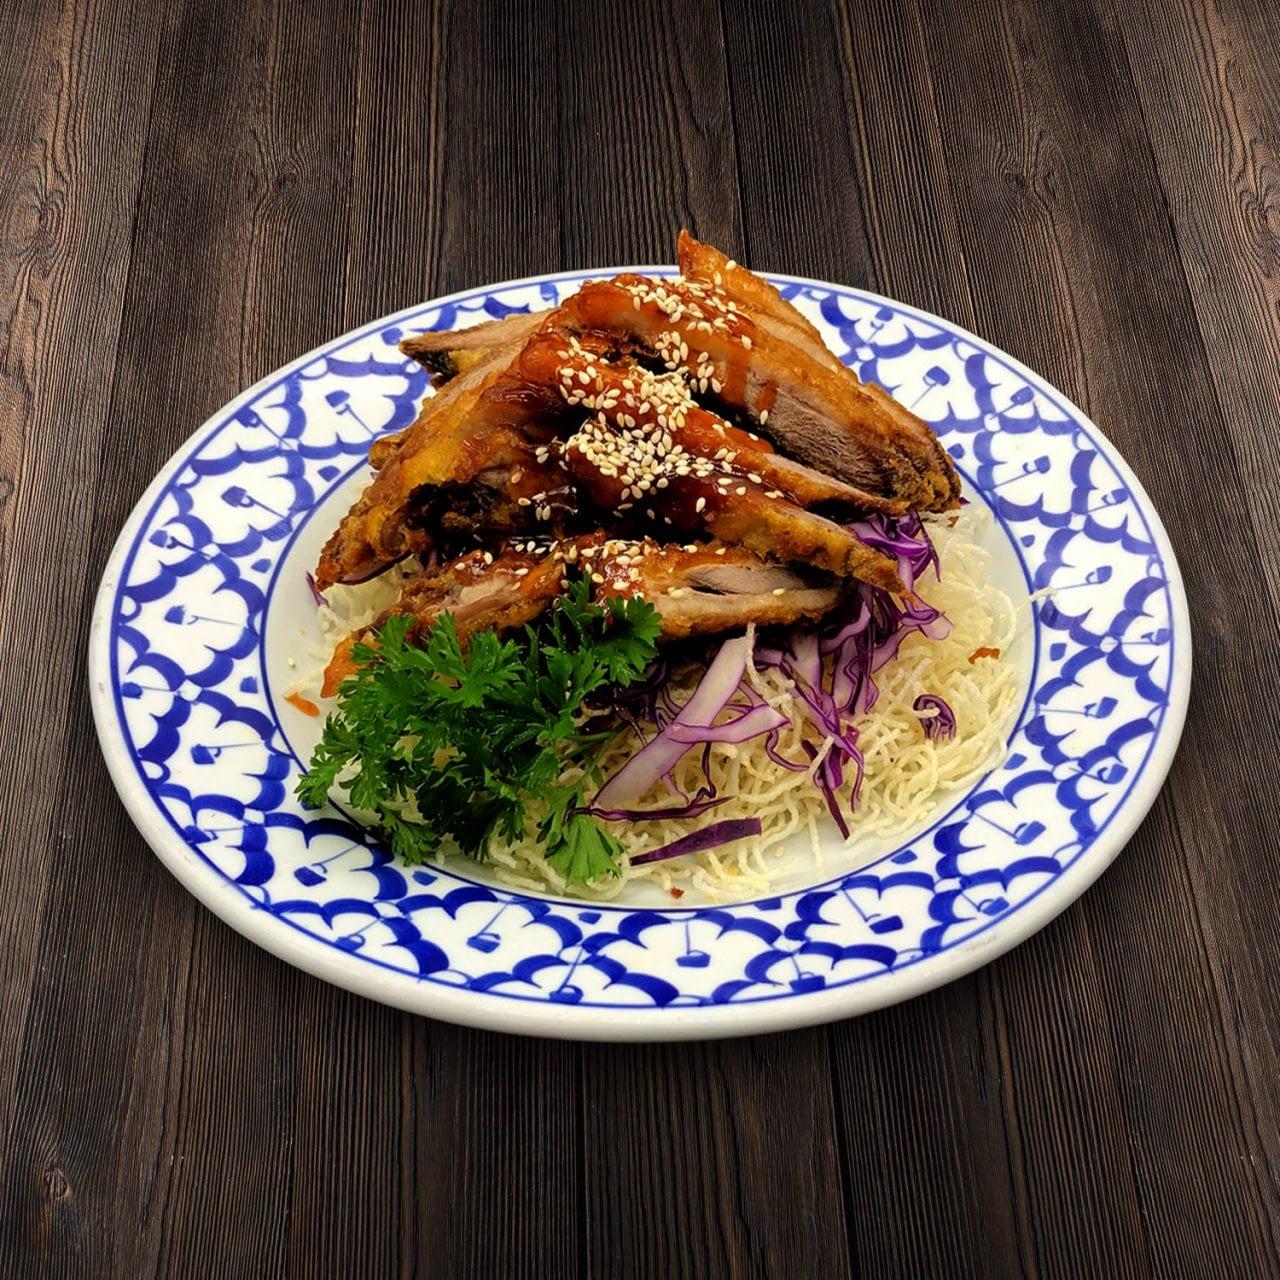 Thai Food Delivery Kuala Lumpur Crispy Duck with Crispy Rice Vernicelli